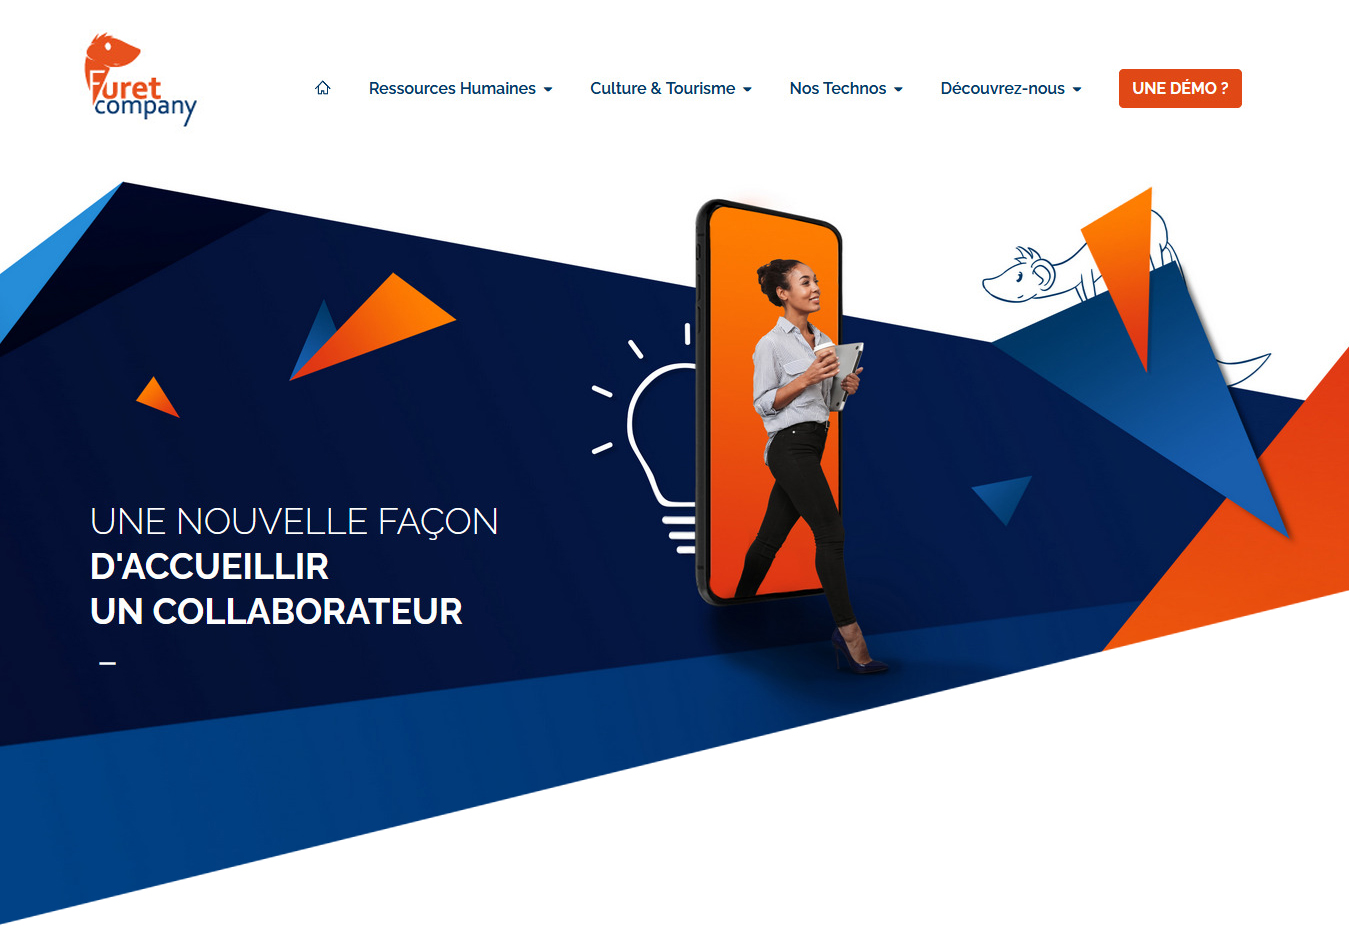 jane-et-bernie-illustrations-furet-company-header-ressources-humaines